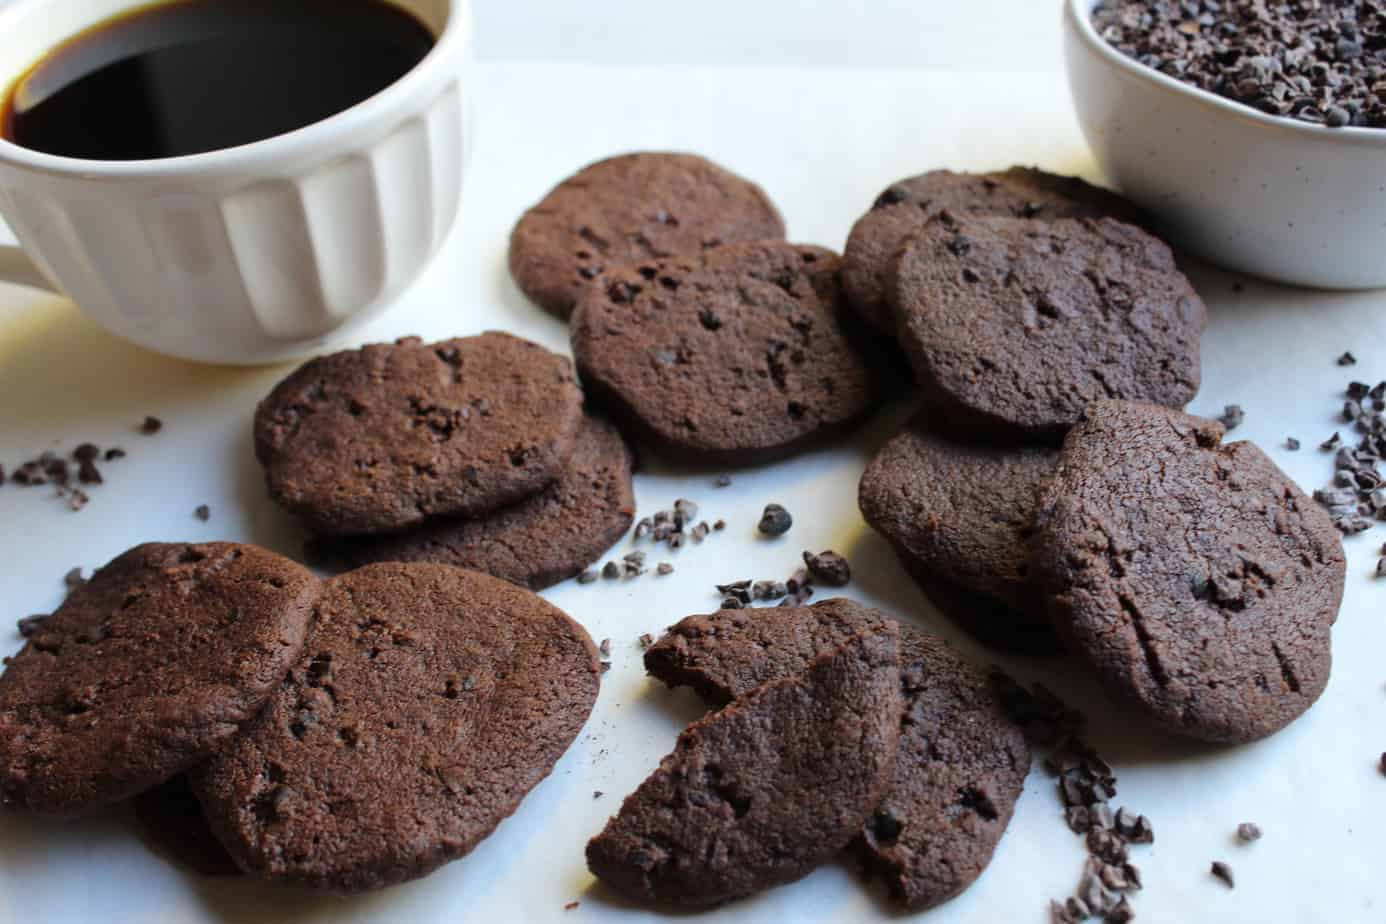 Cacao-nib-and-sea-salt-shortbread-cookies